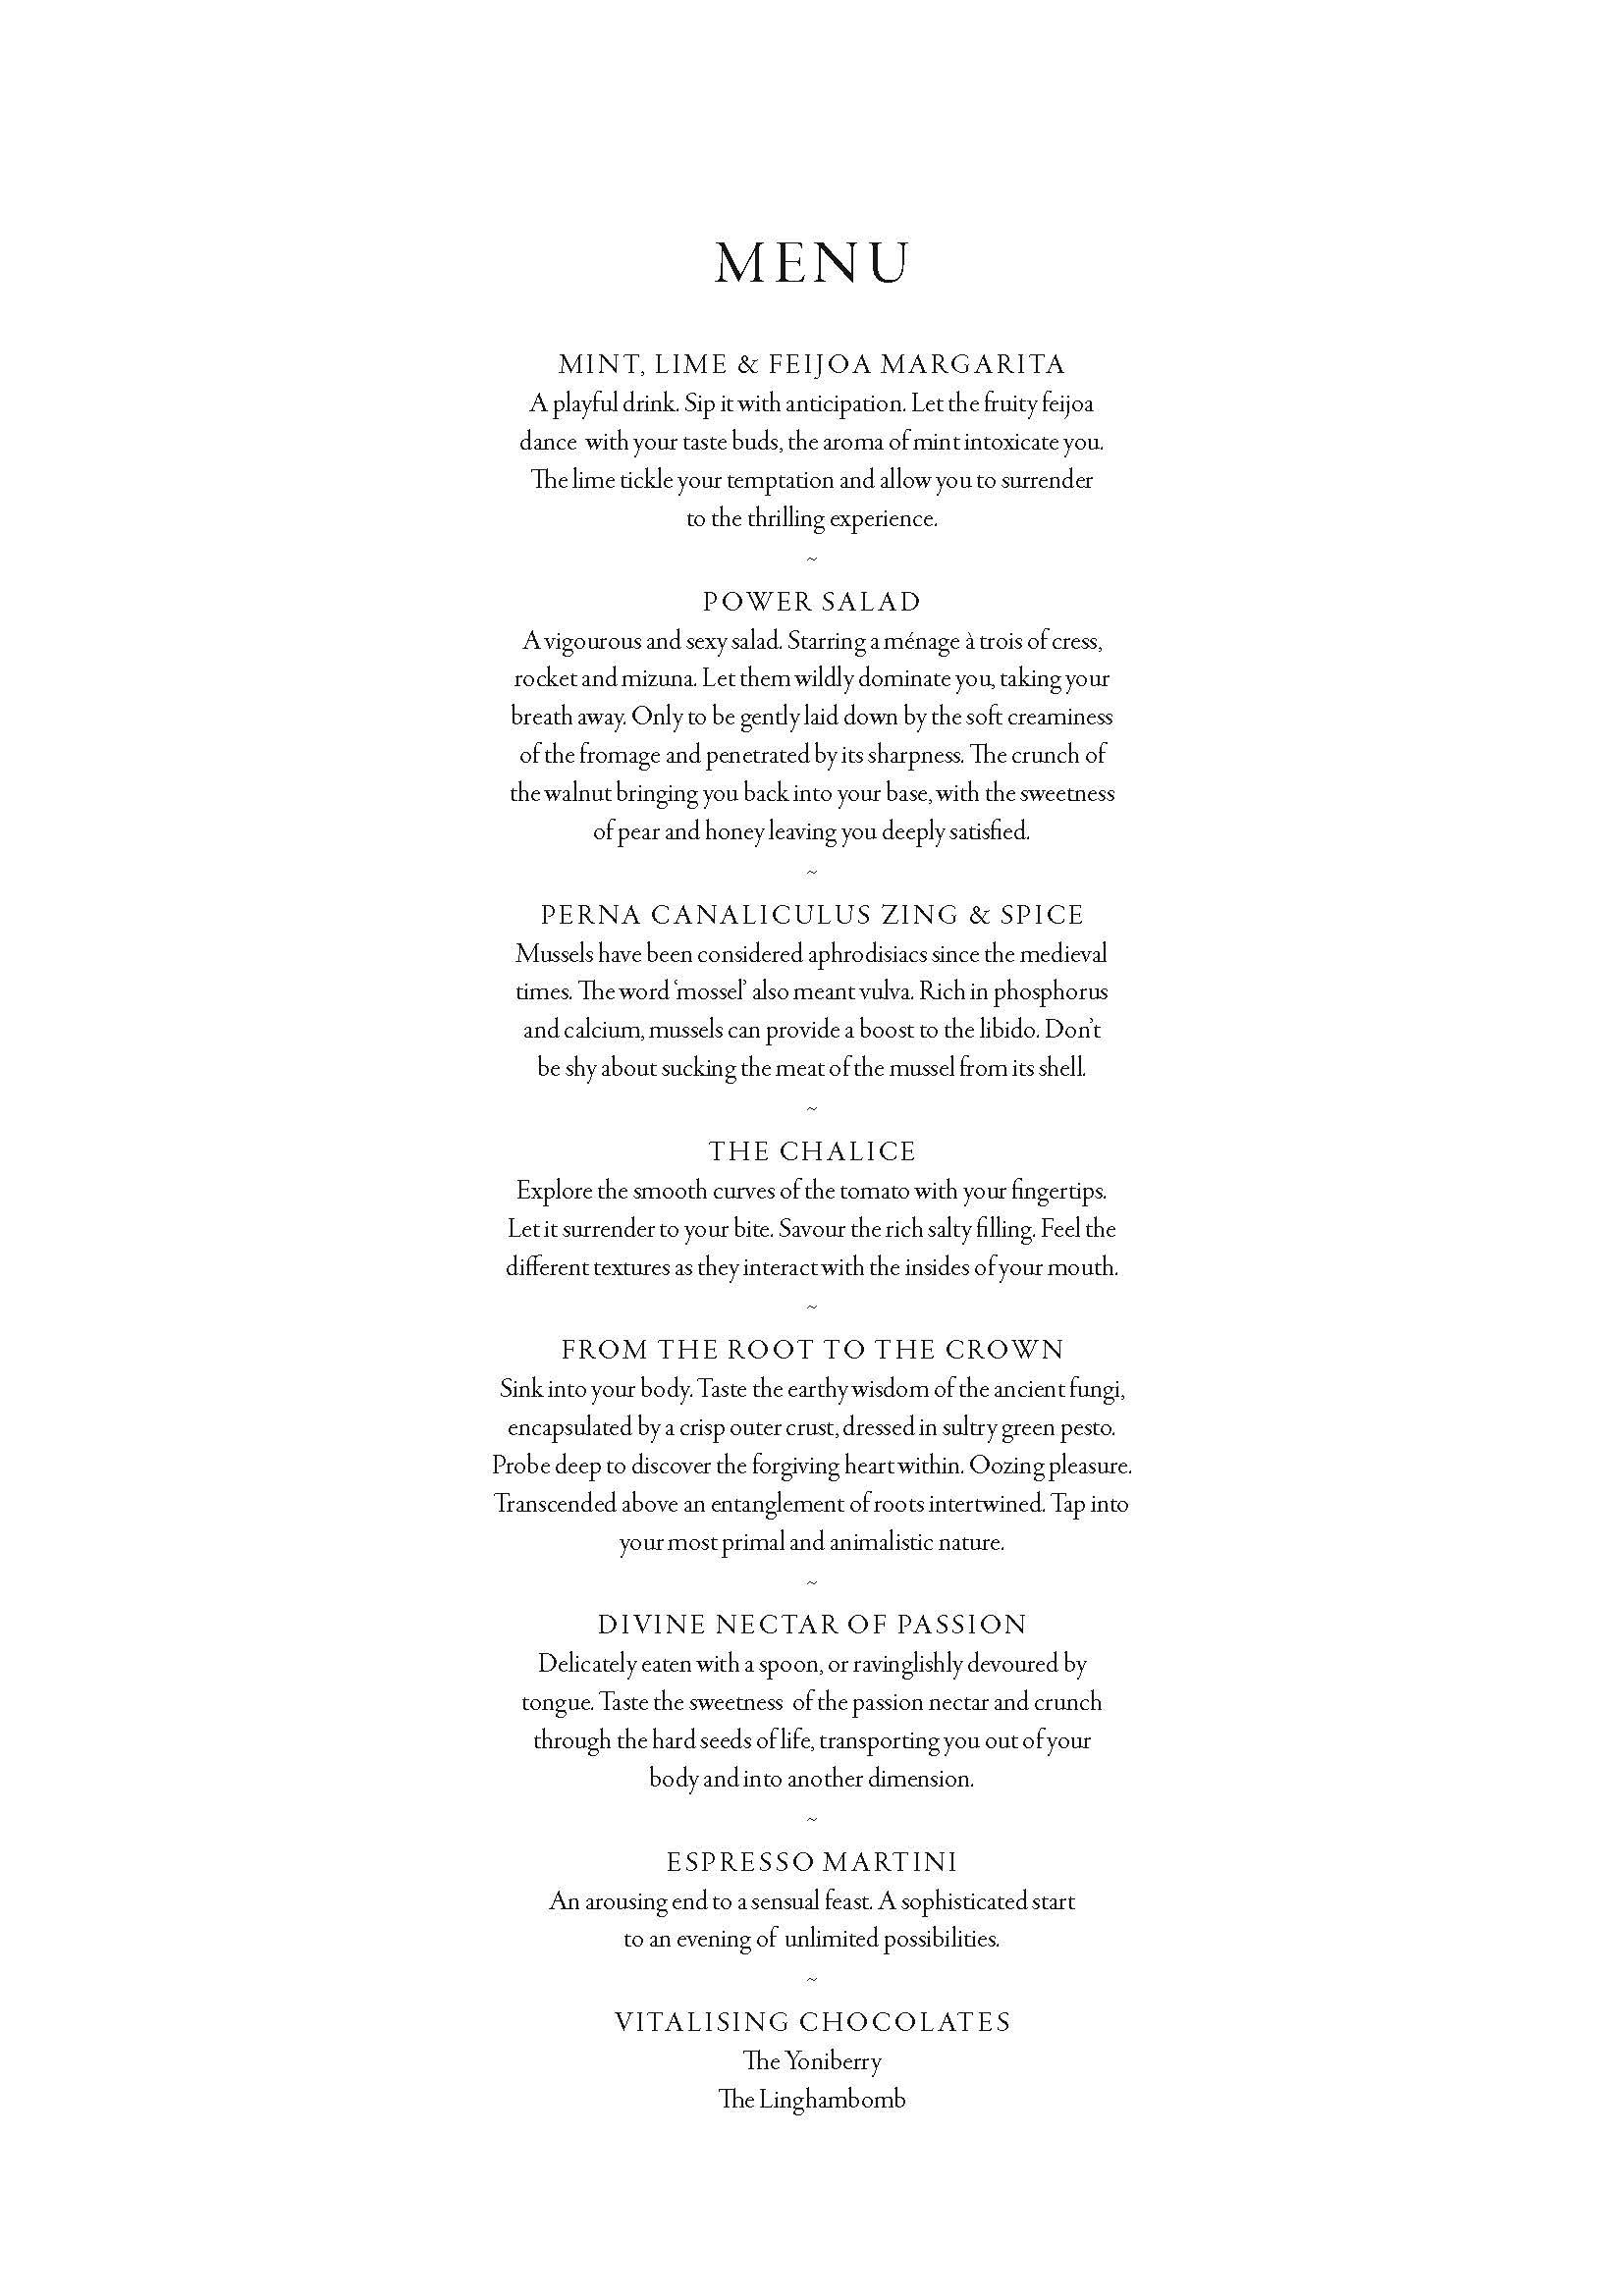 feast of the senses menu